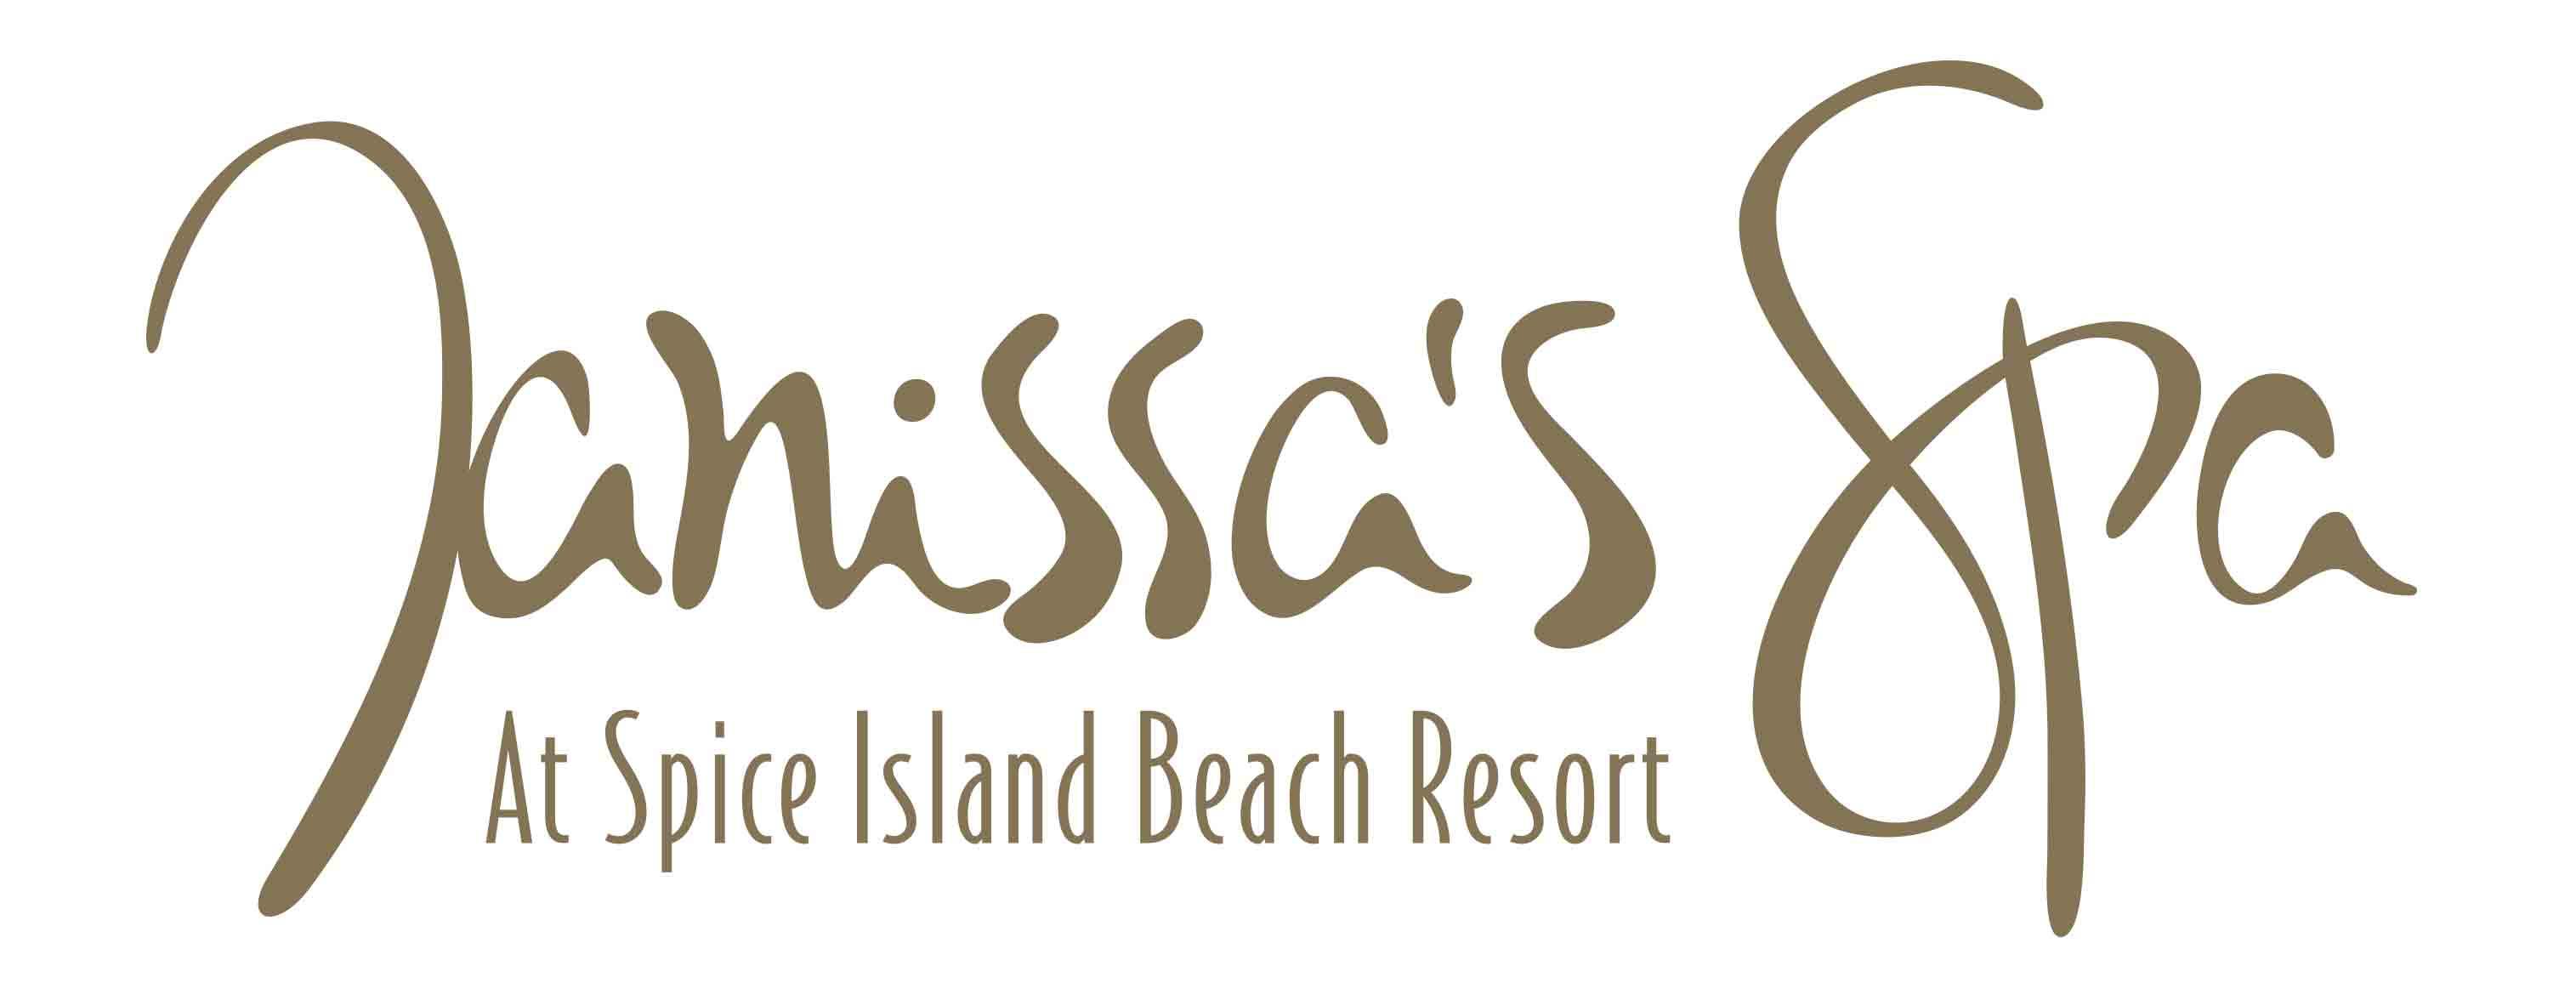 Janissa's spa logo at Spice Island Beach Resort in Grenada